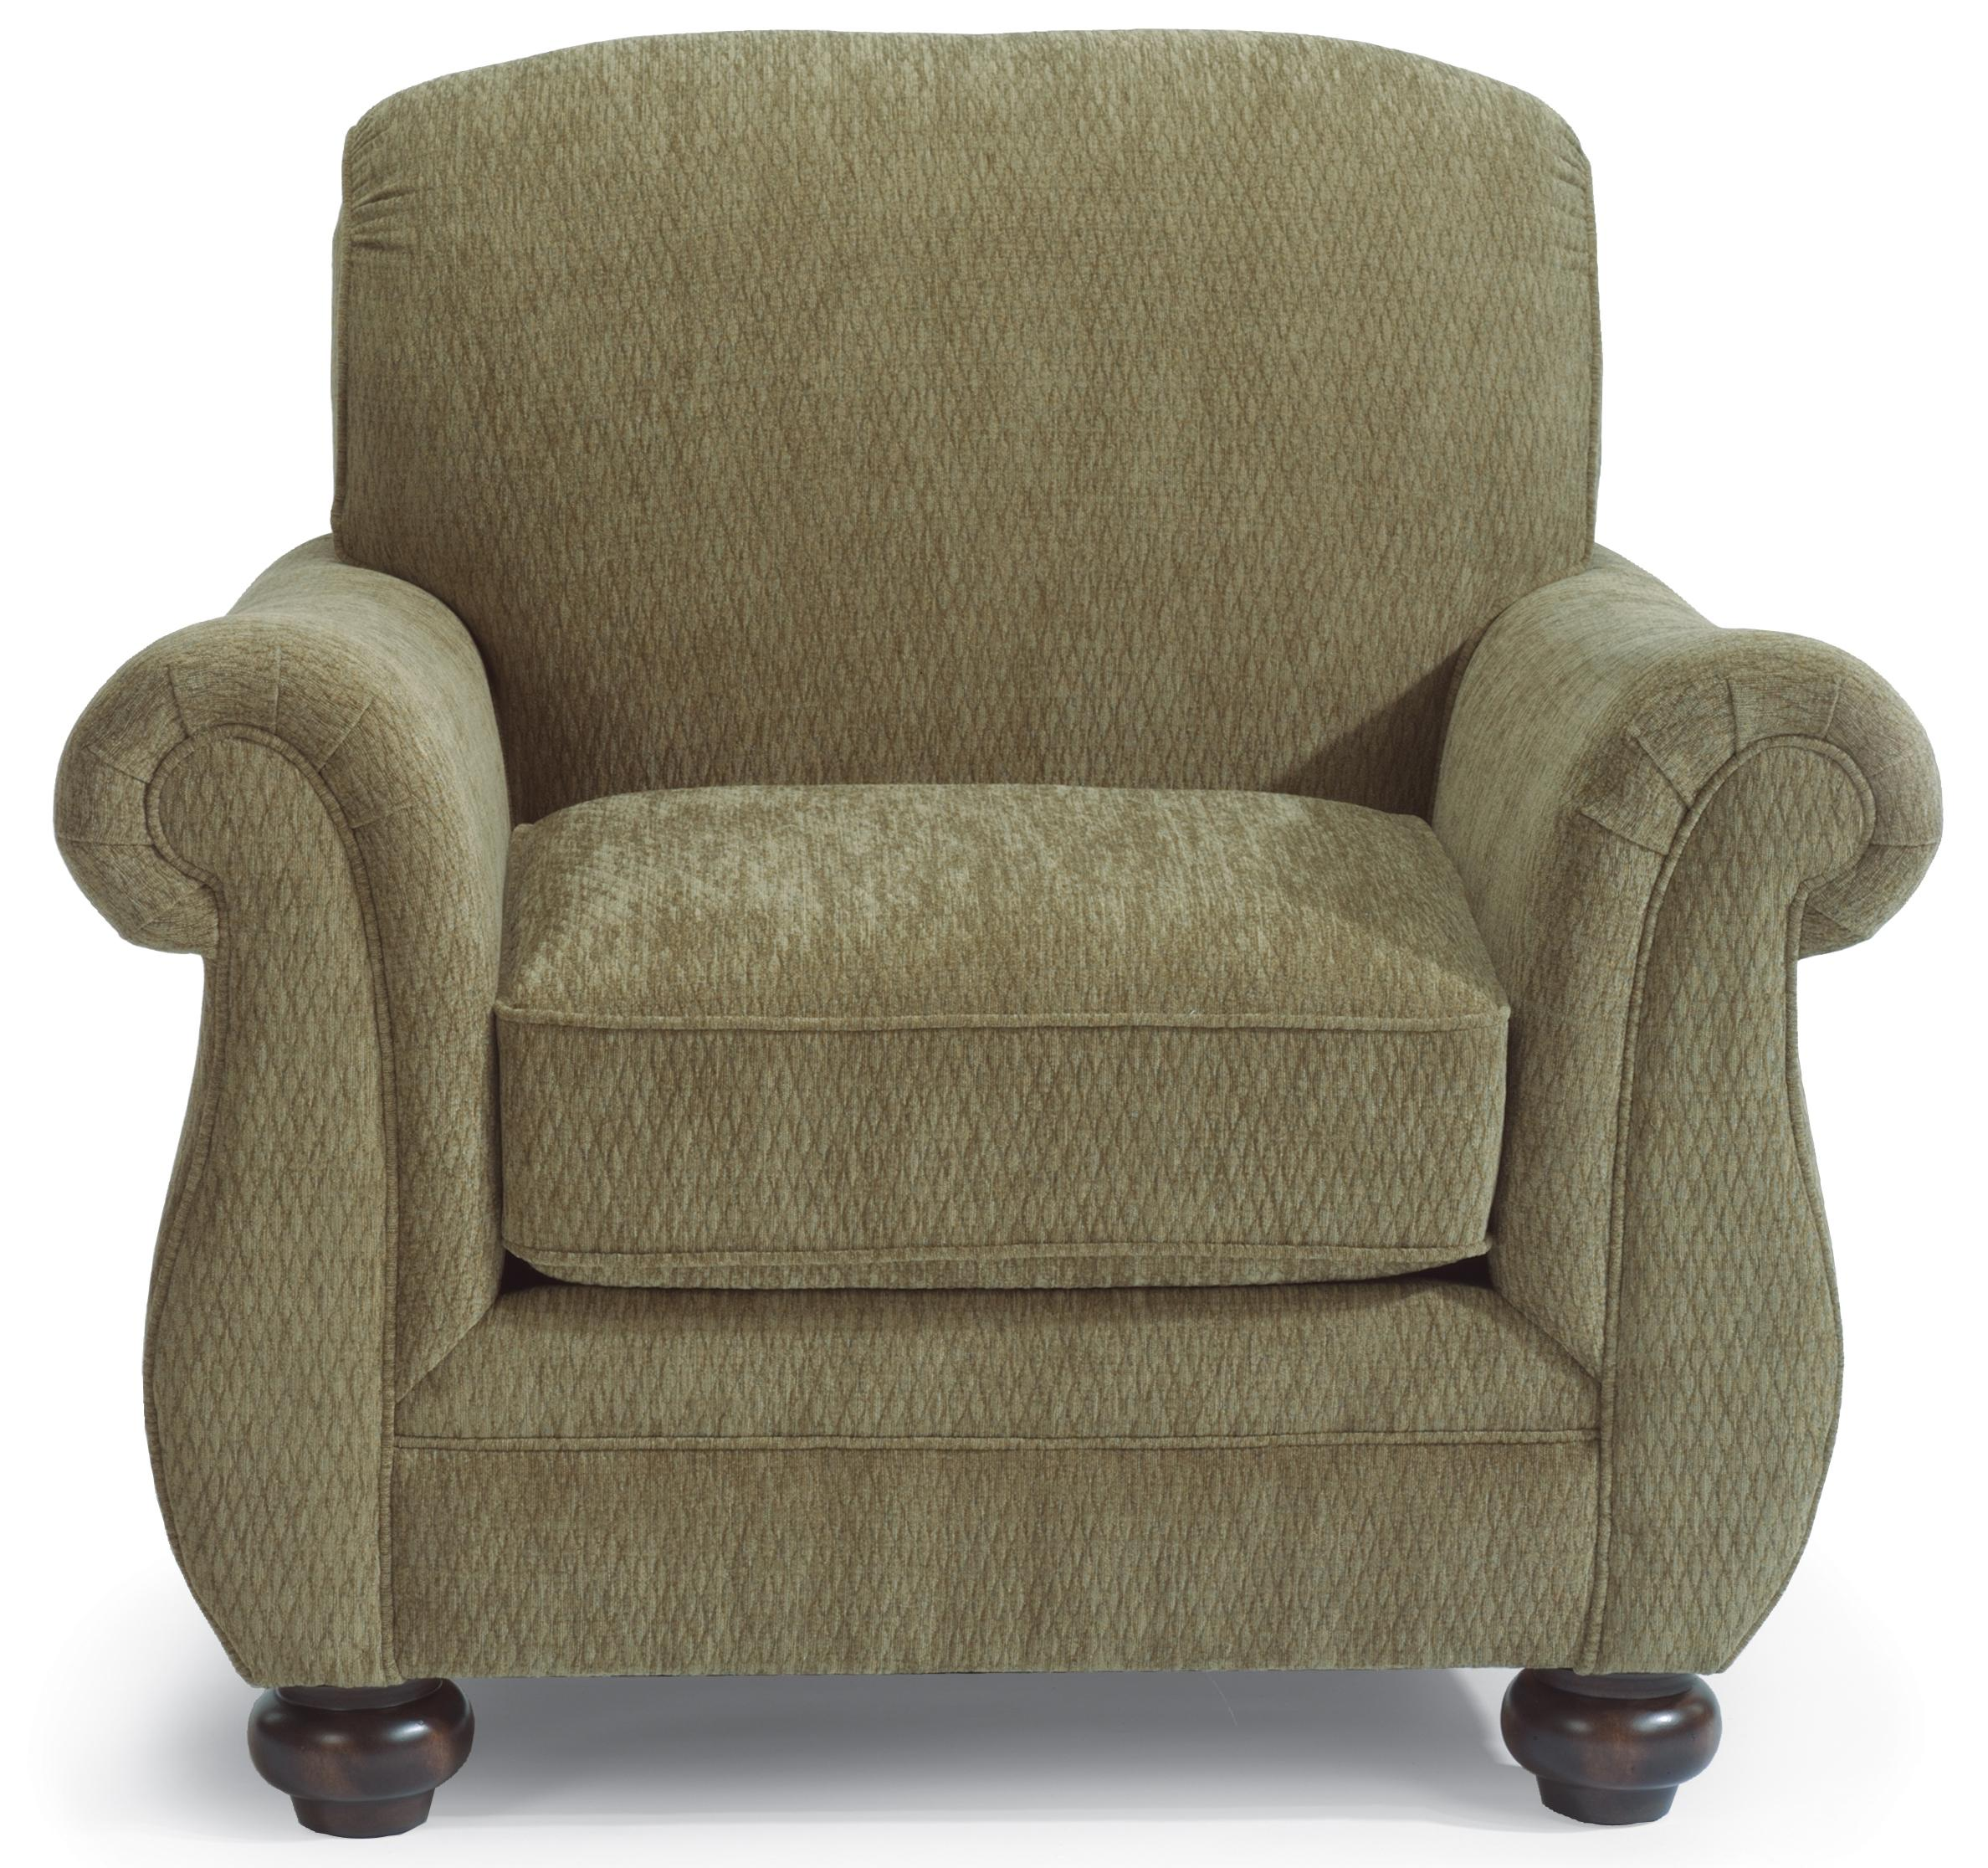 Flexsteel Winston Upholstered Arm Chair With Bun Feet